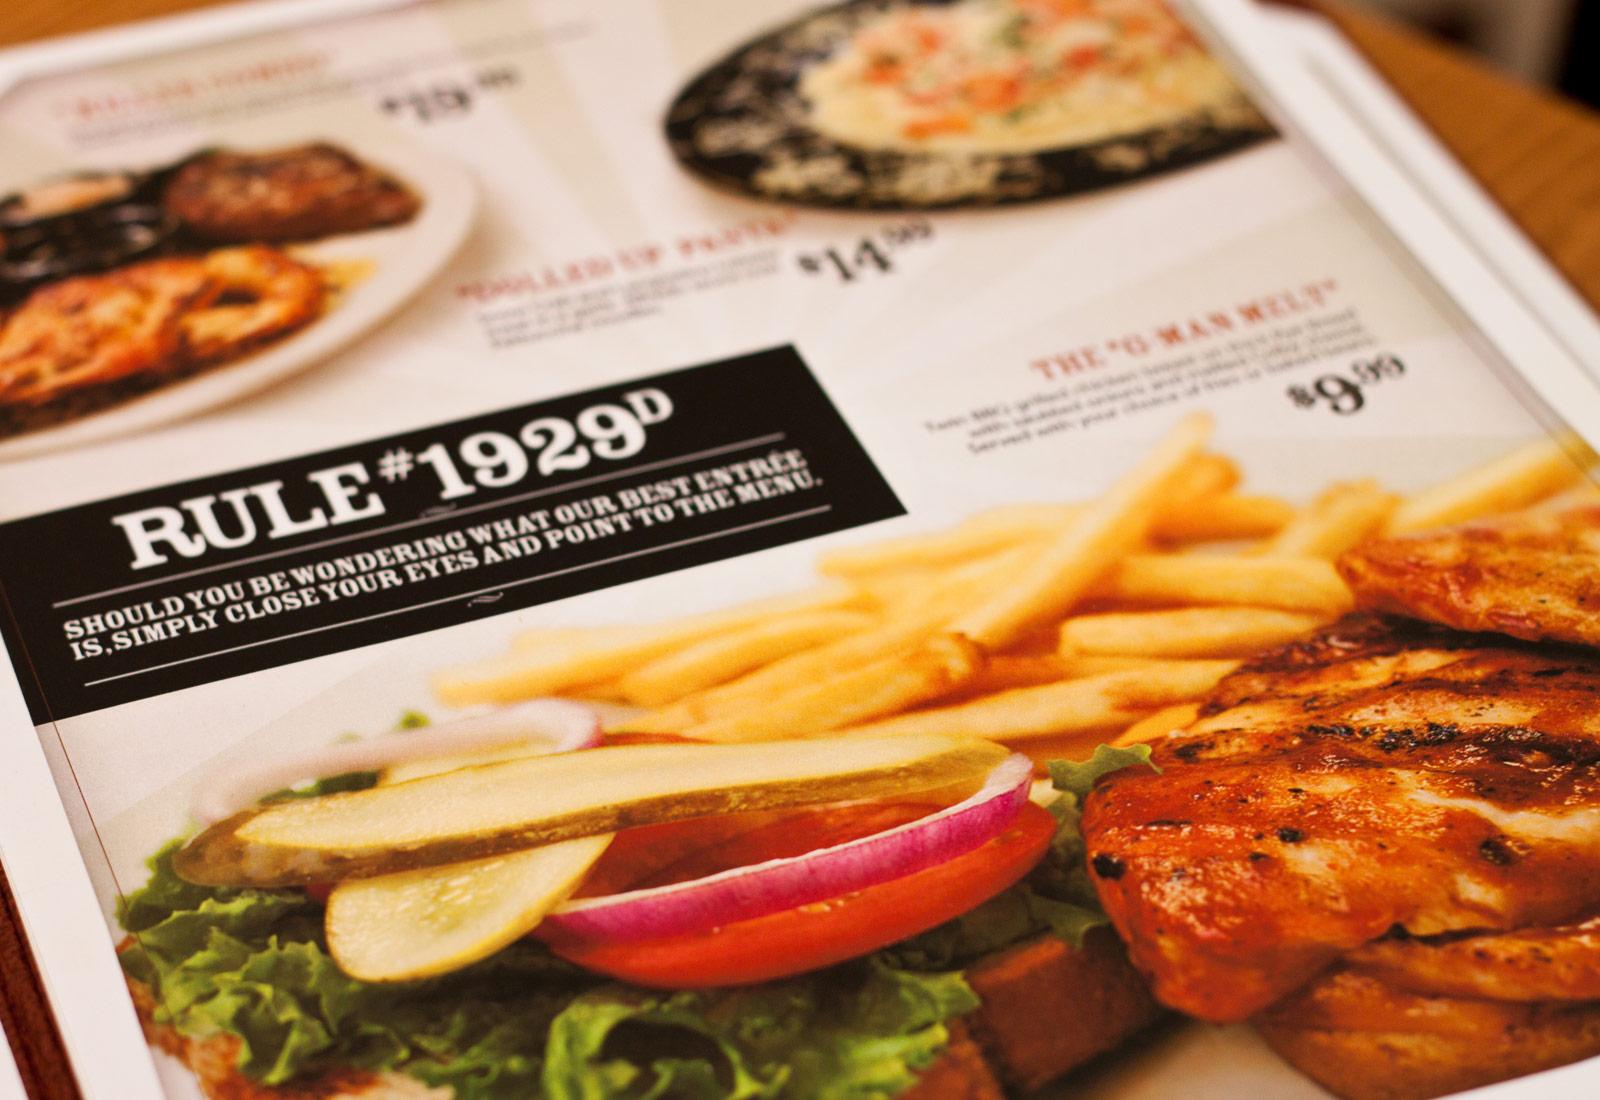 Hideout Steakouse Menu Spread